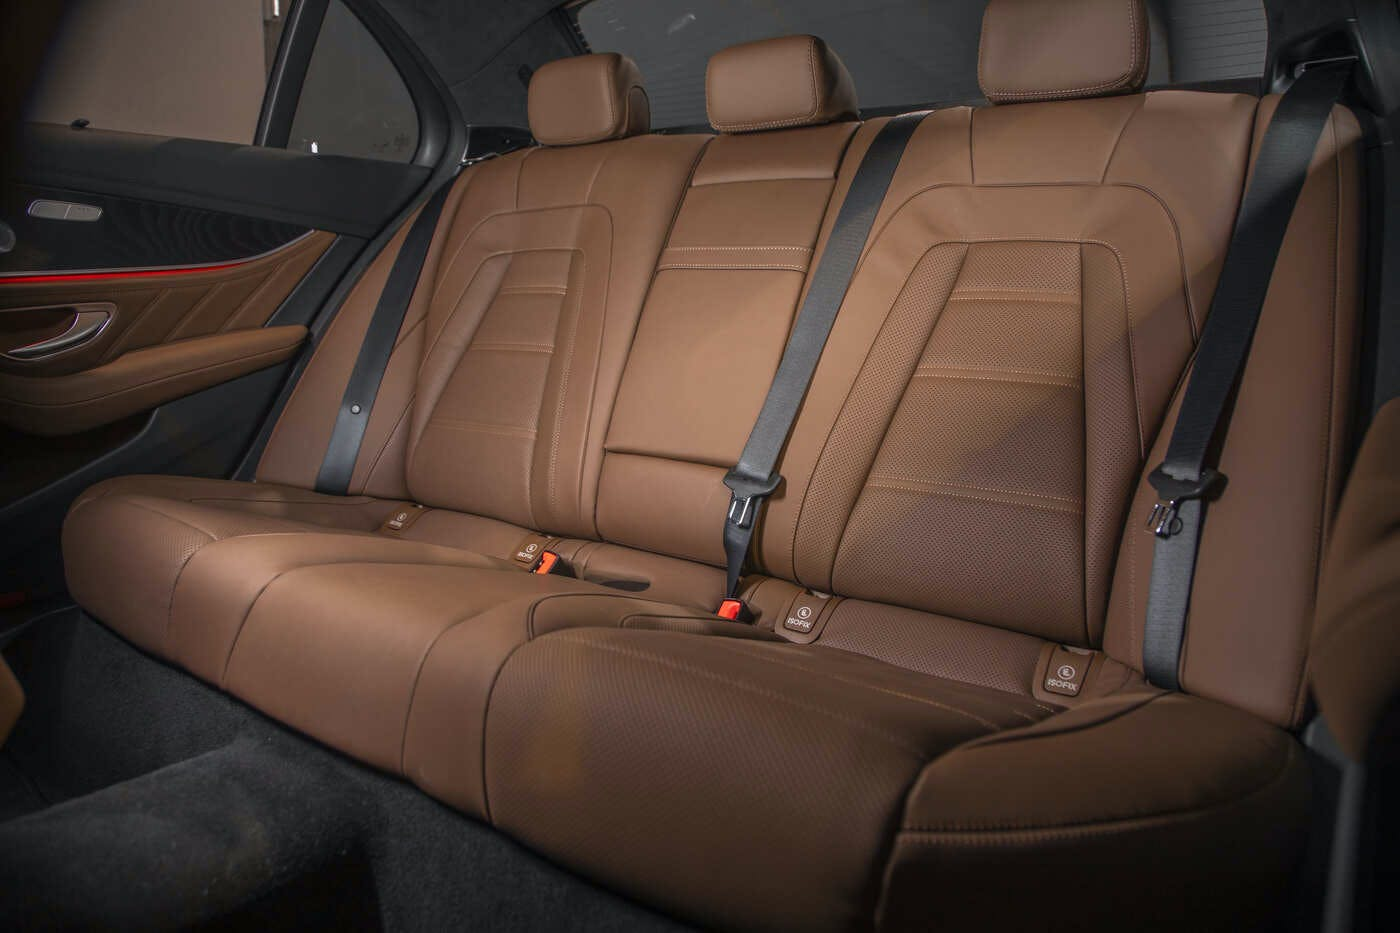 Black Leather Colour Dye Restorer Mercedes Benz E Class Scratches Seats Repair Archives Statelegals Staradvertiser Com